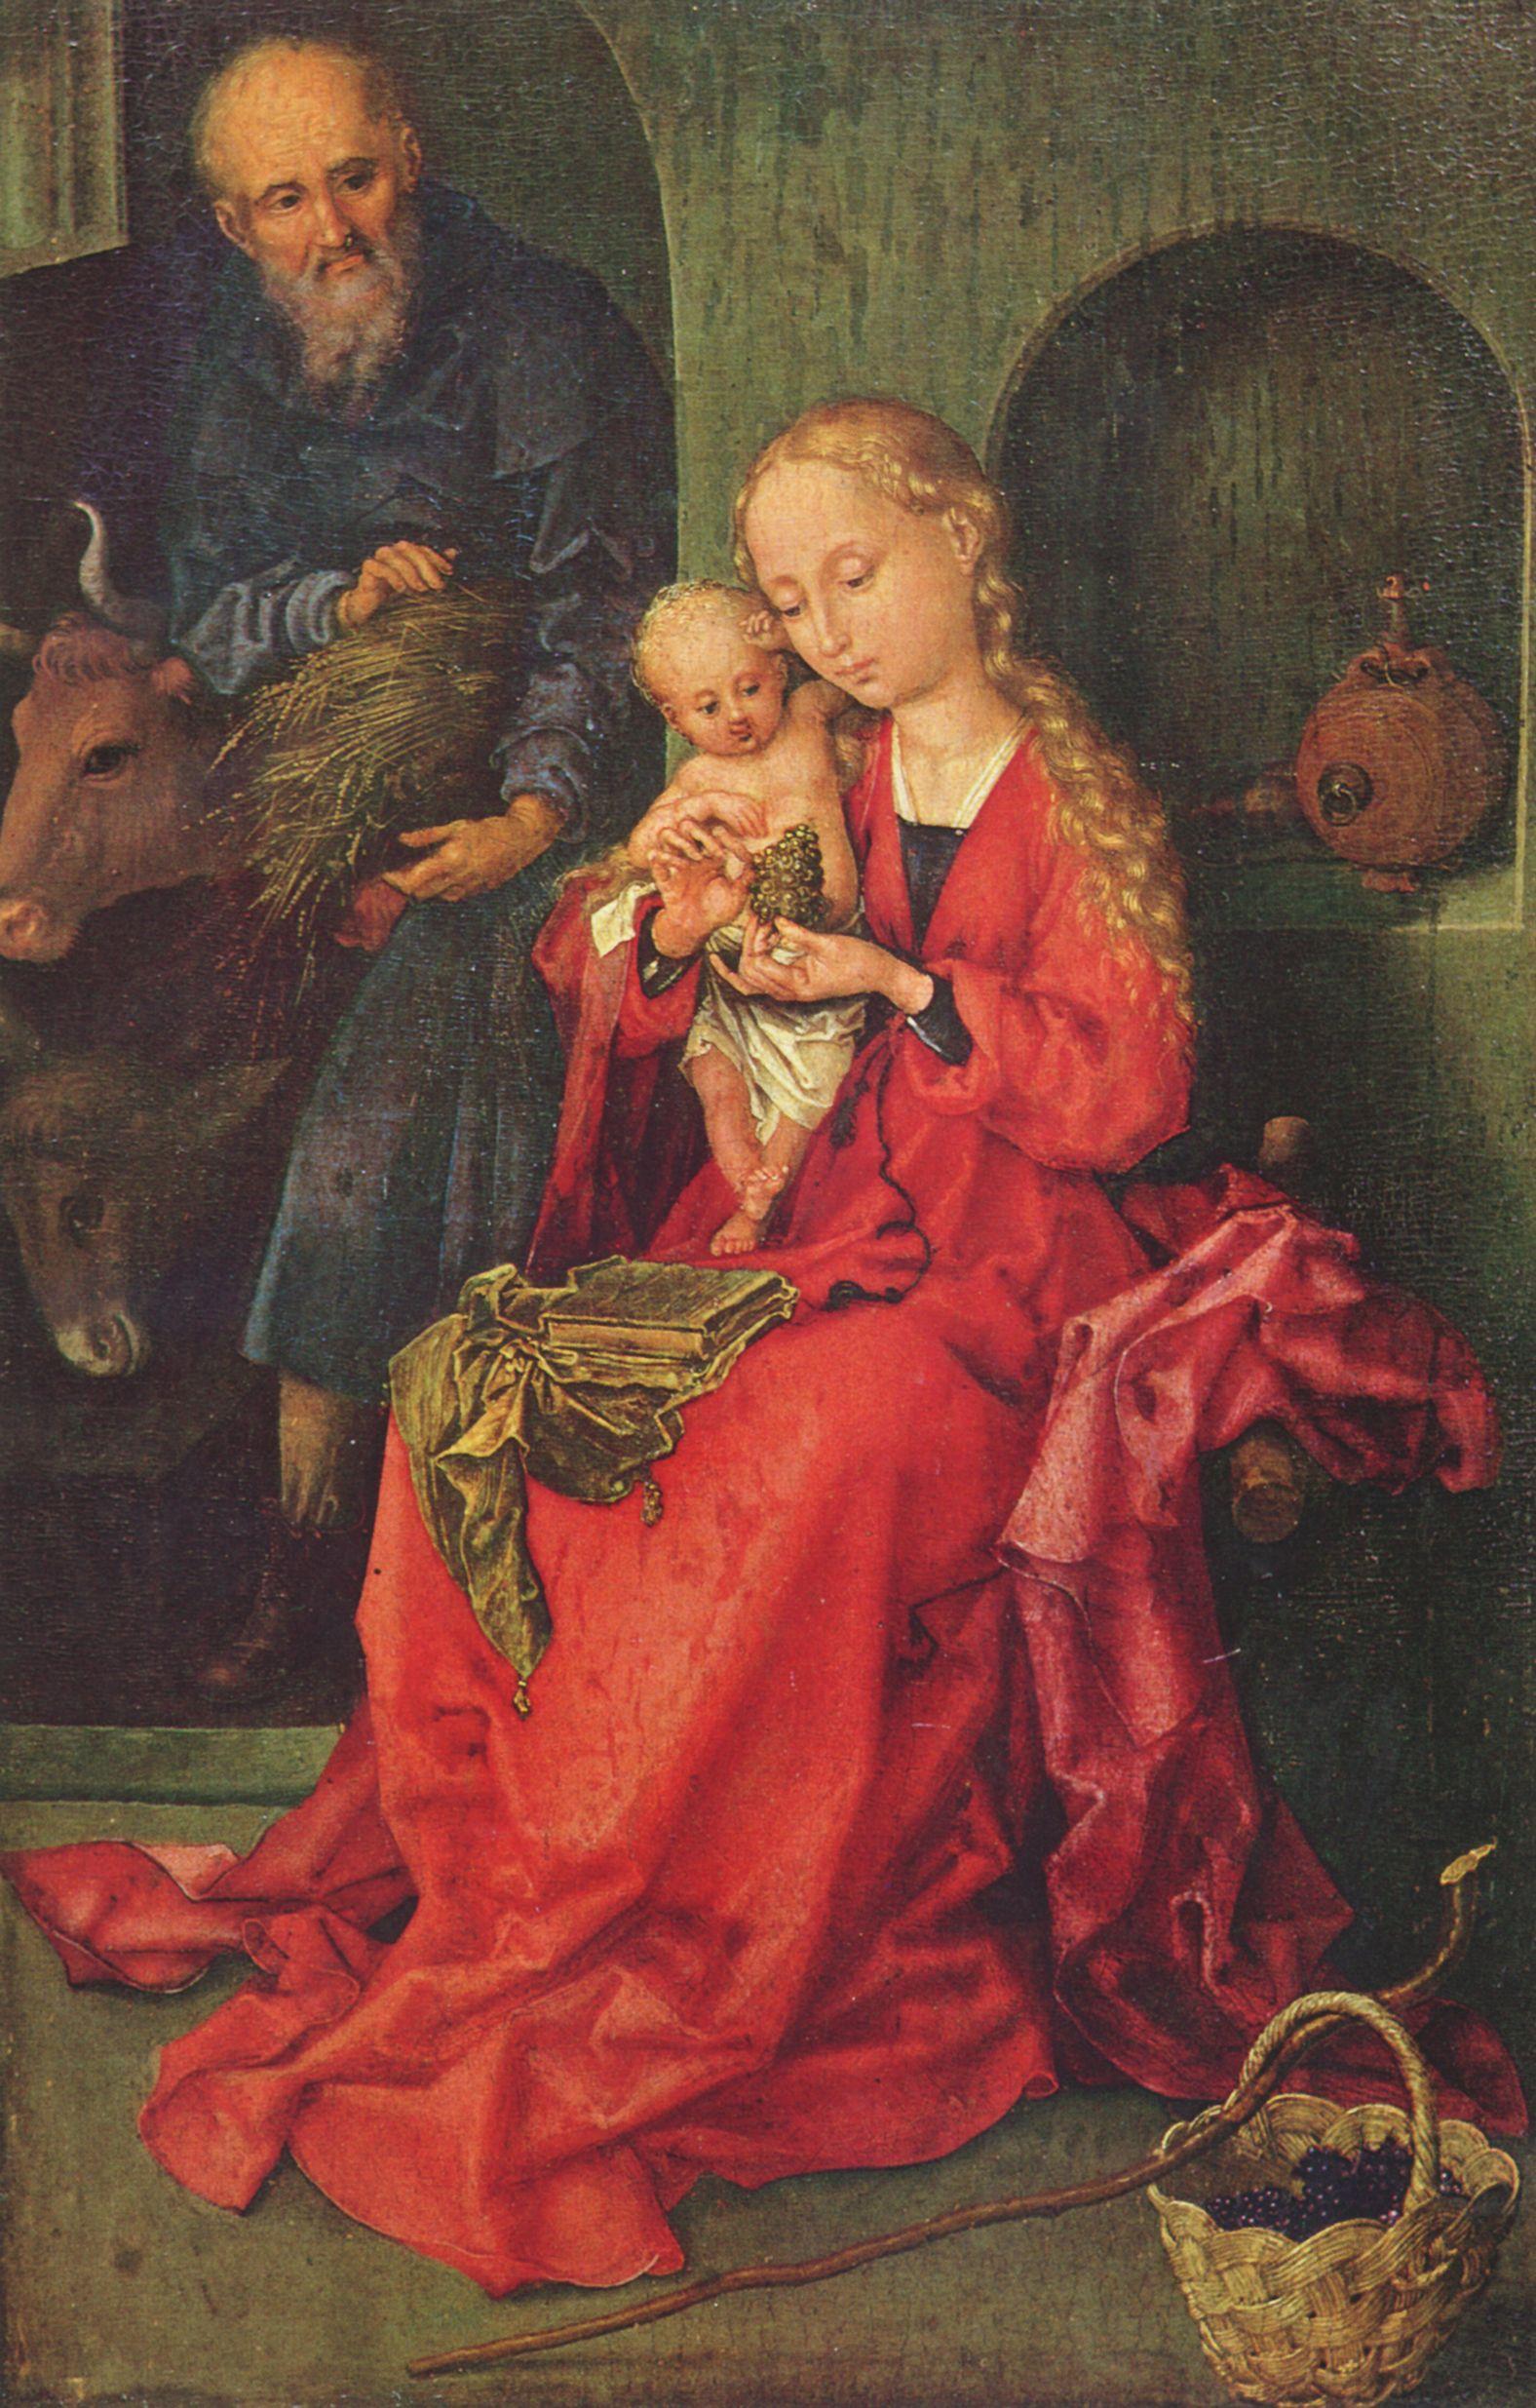 http://www.malerei-meisterwerke.de/images_large/martin-schongauer-heilige-familie-08929.jpg